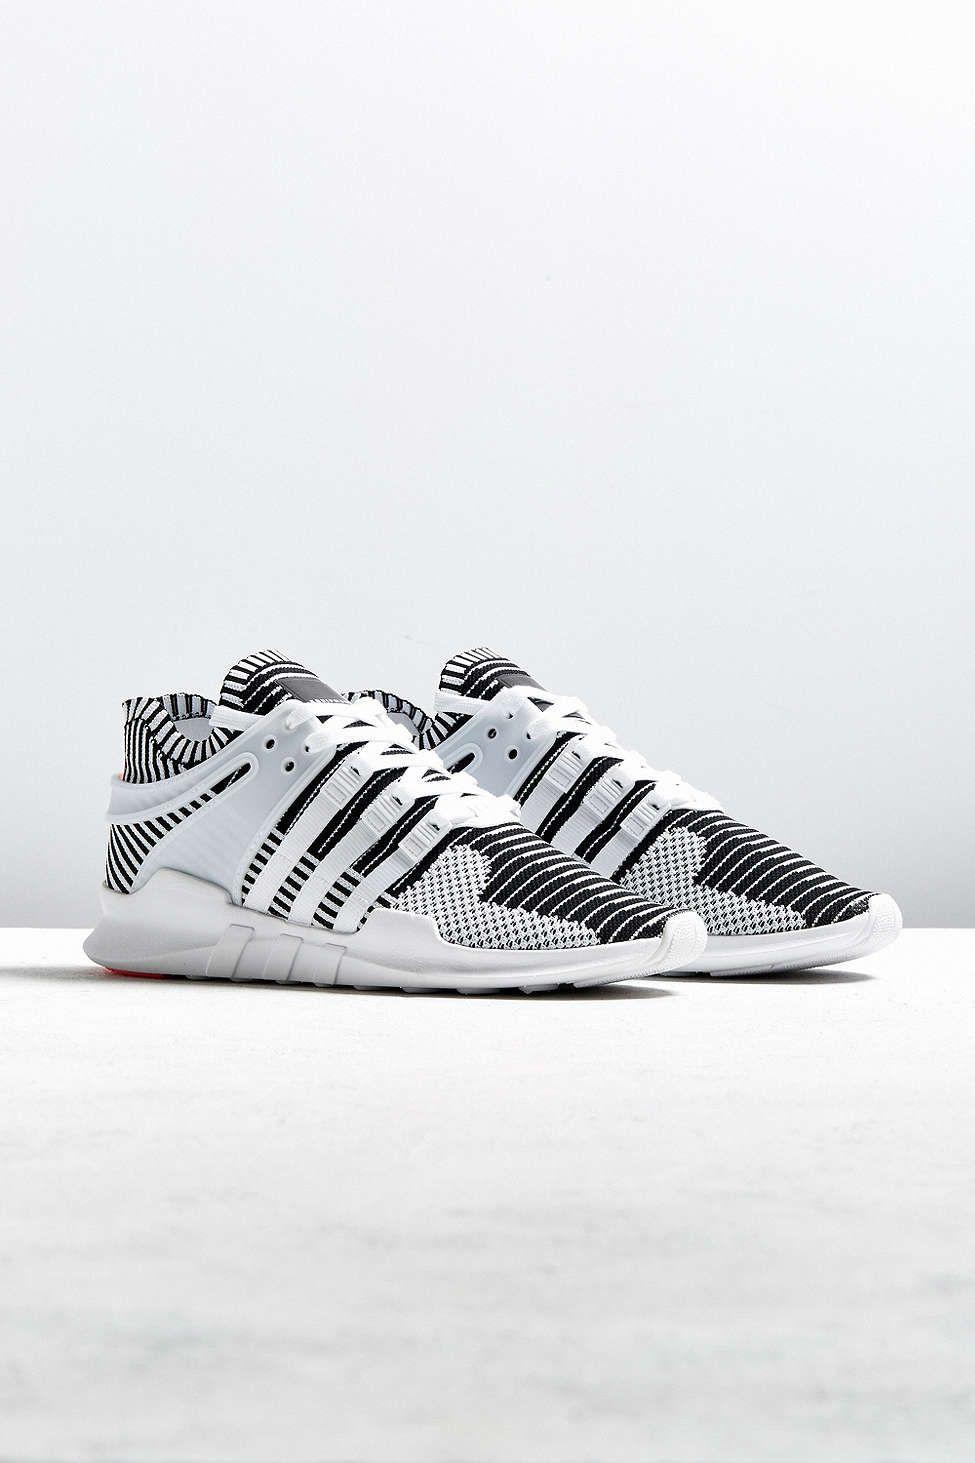 129af95afa1d adidas EQT Support ADV Primeknit Sneaker